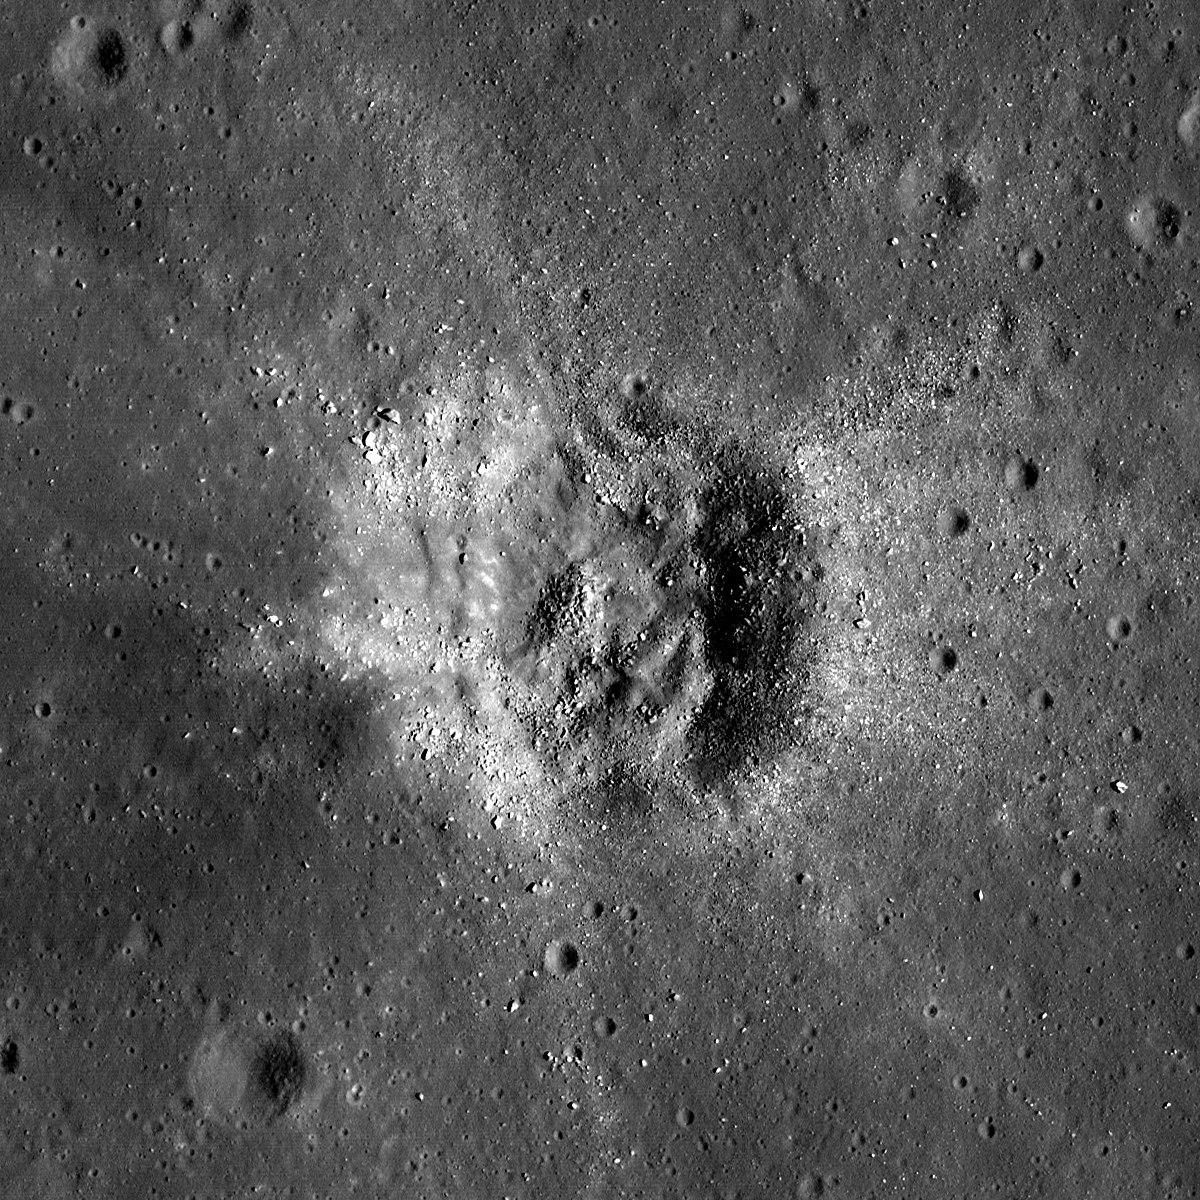 K Name Hd Wallpaper West Lunar Crater Wikipedia